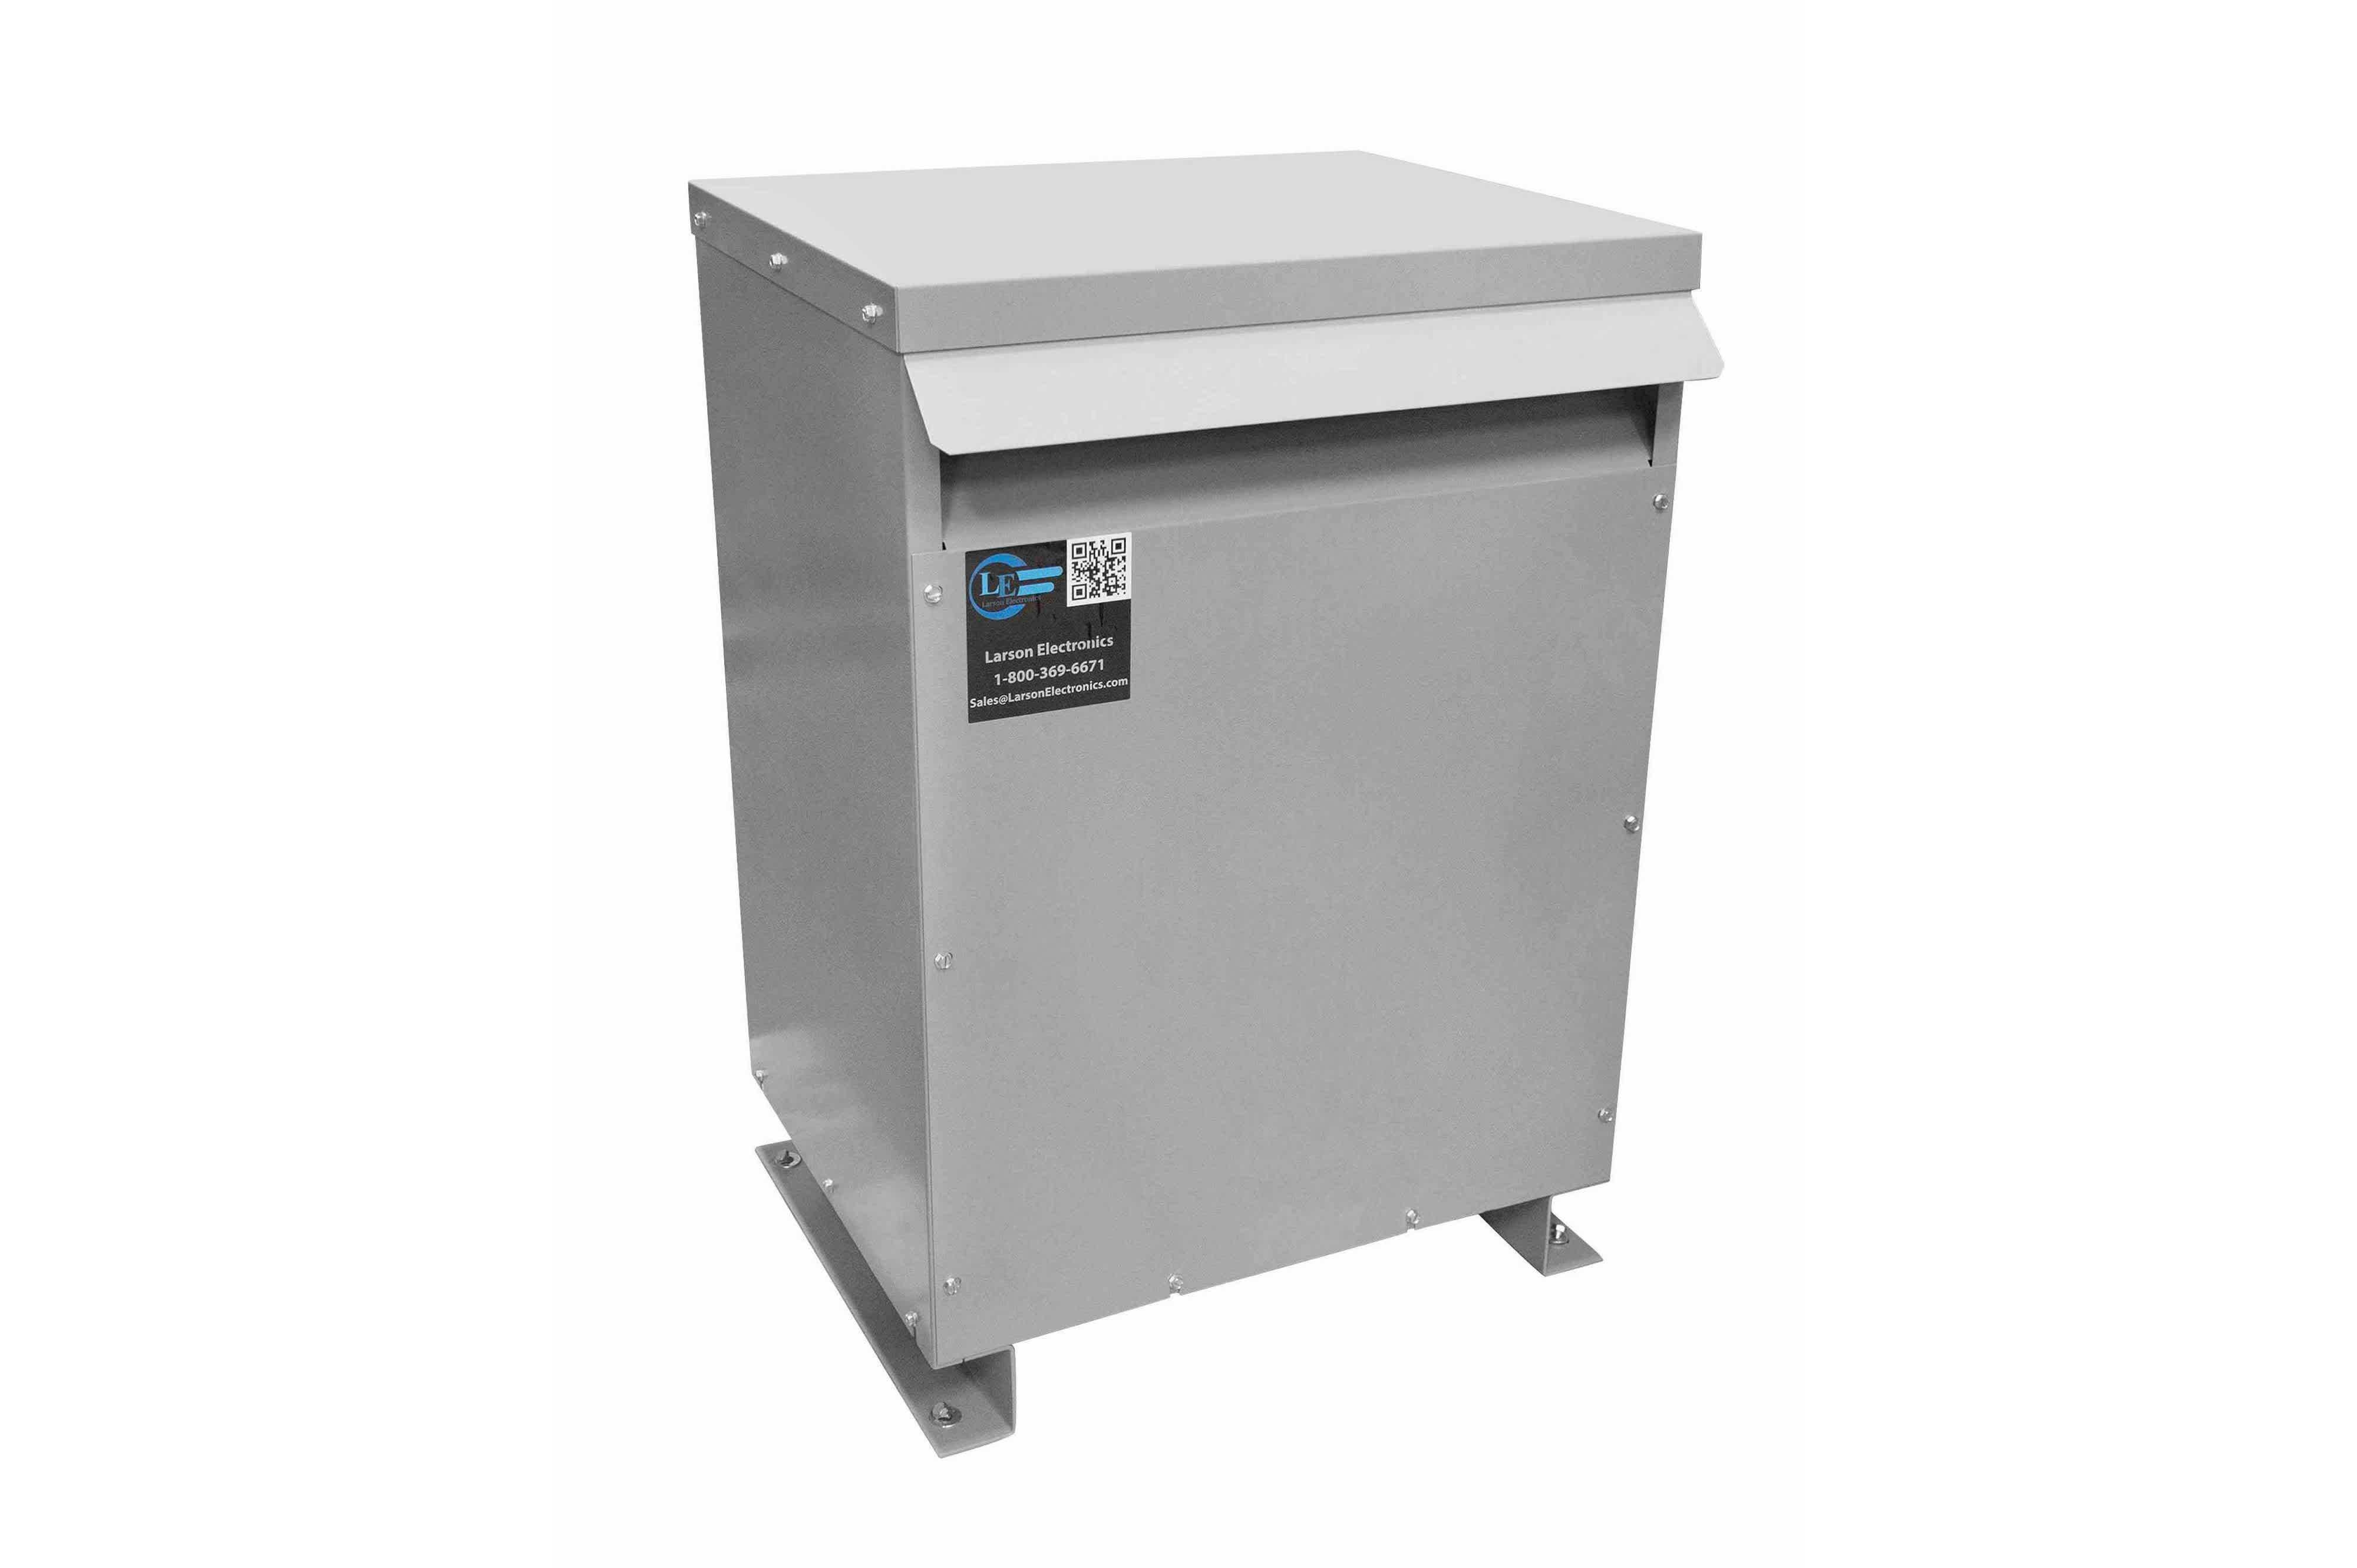 40 kVA 3PH Isolation Transformer, 400V Wye Primary, 240V Delta Secondary, N3R, Ventilated, 60 Hz